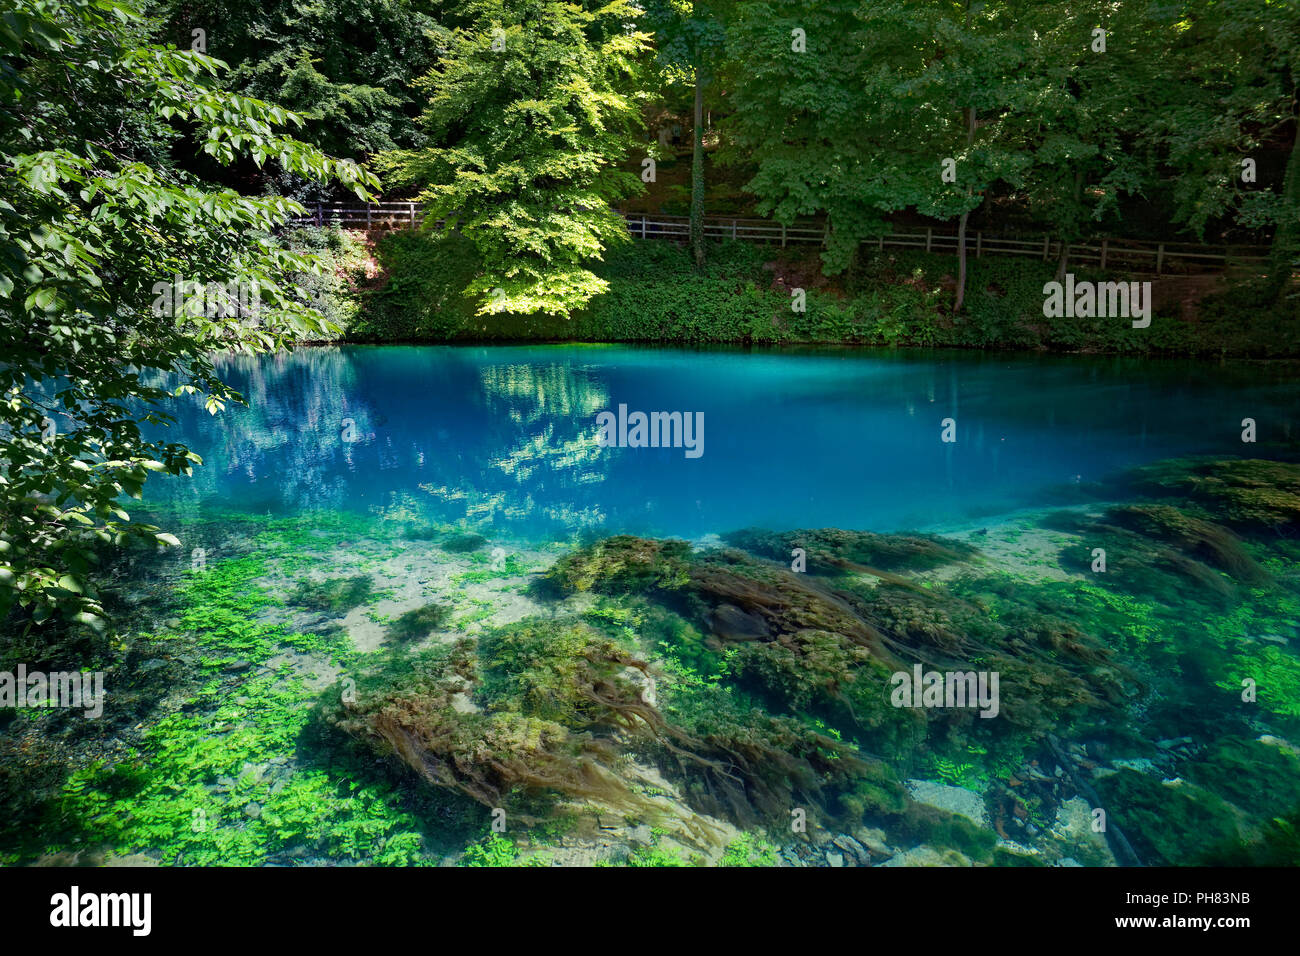 Blautopf, karst spring, algae, Blaubeuren, Alb-Donau-Kreis, Swabian Alb, Baden Württemberg, Germany Stock Photo